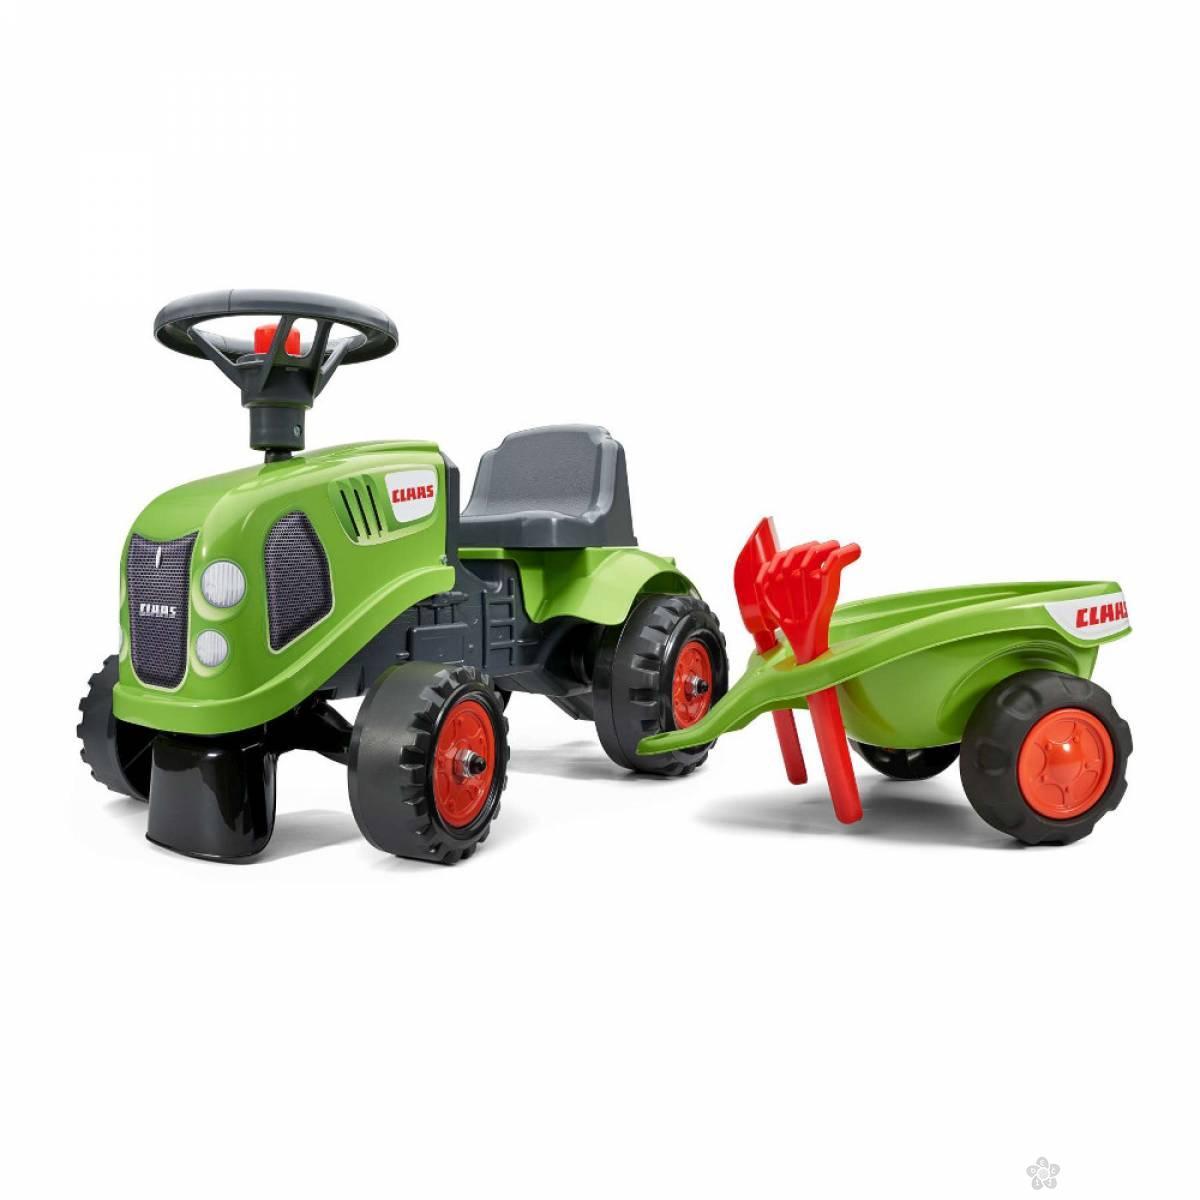 Traktor guralica Claas 212c